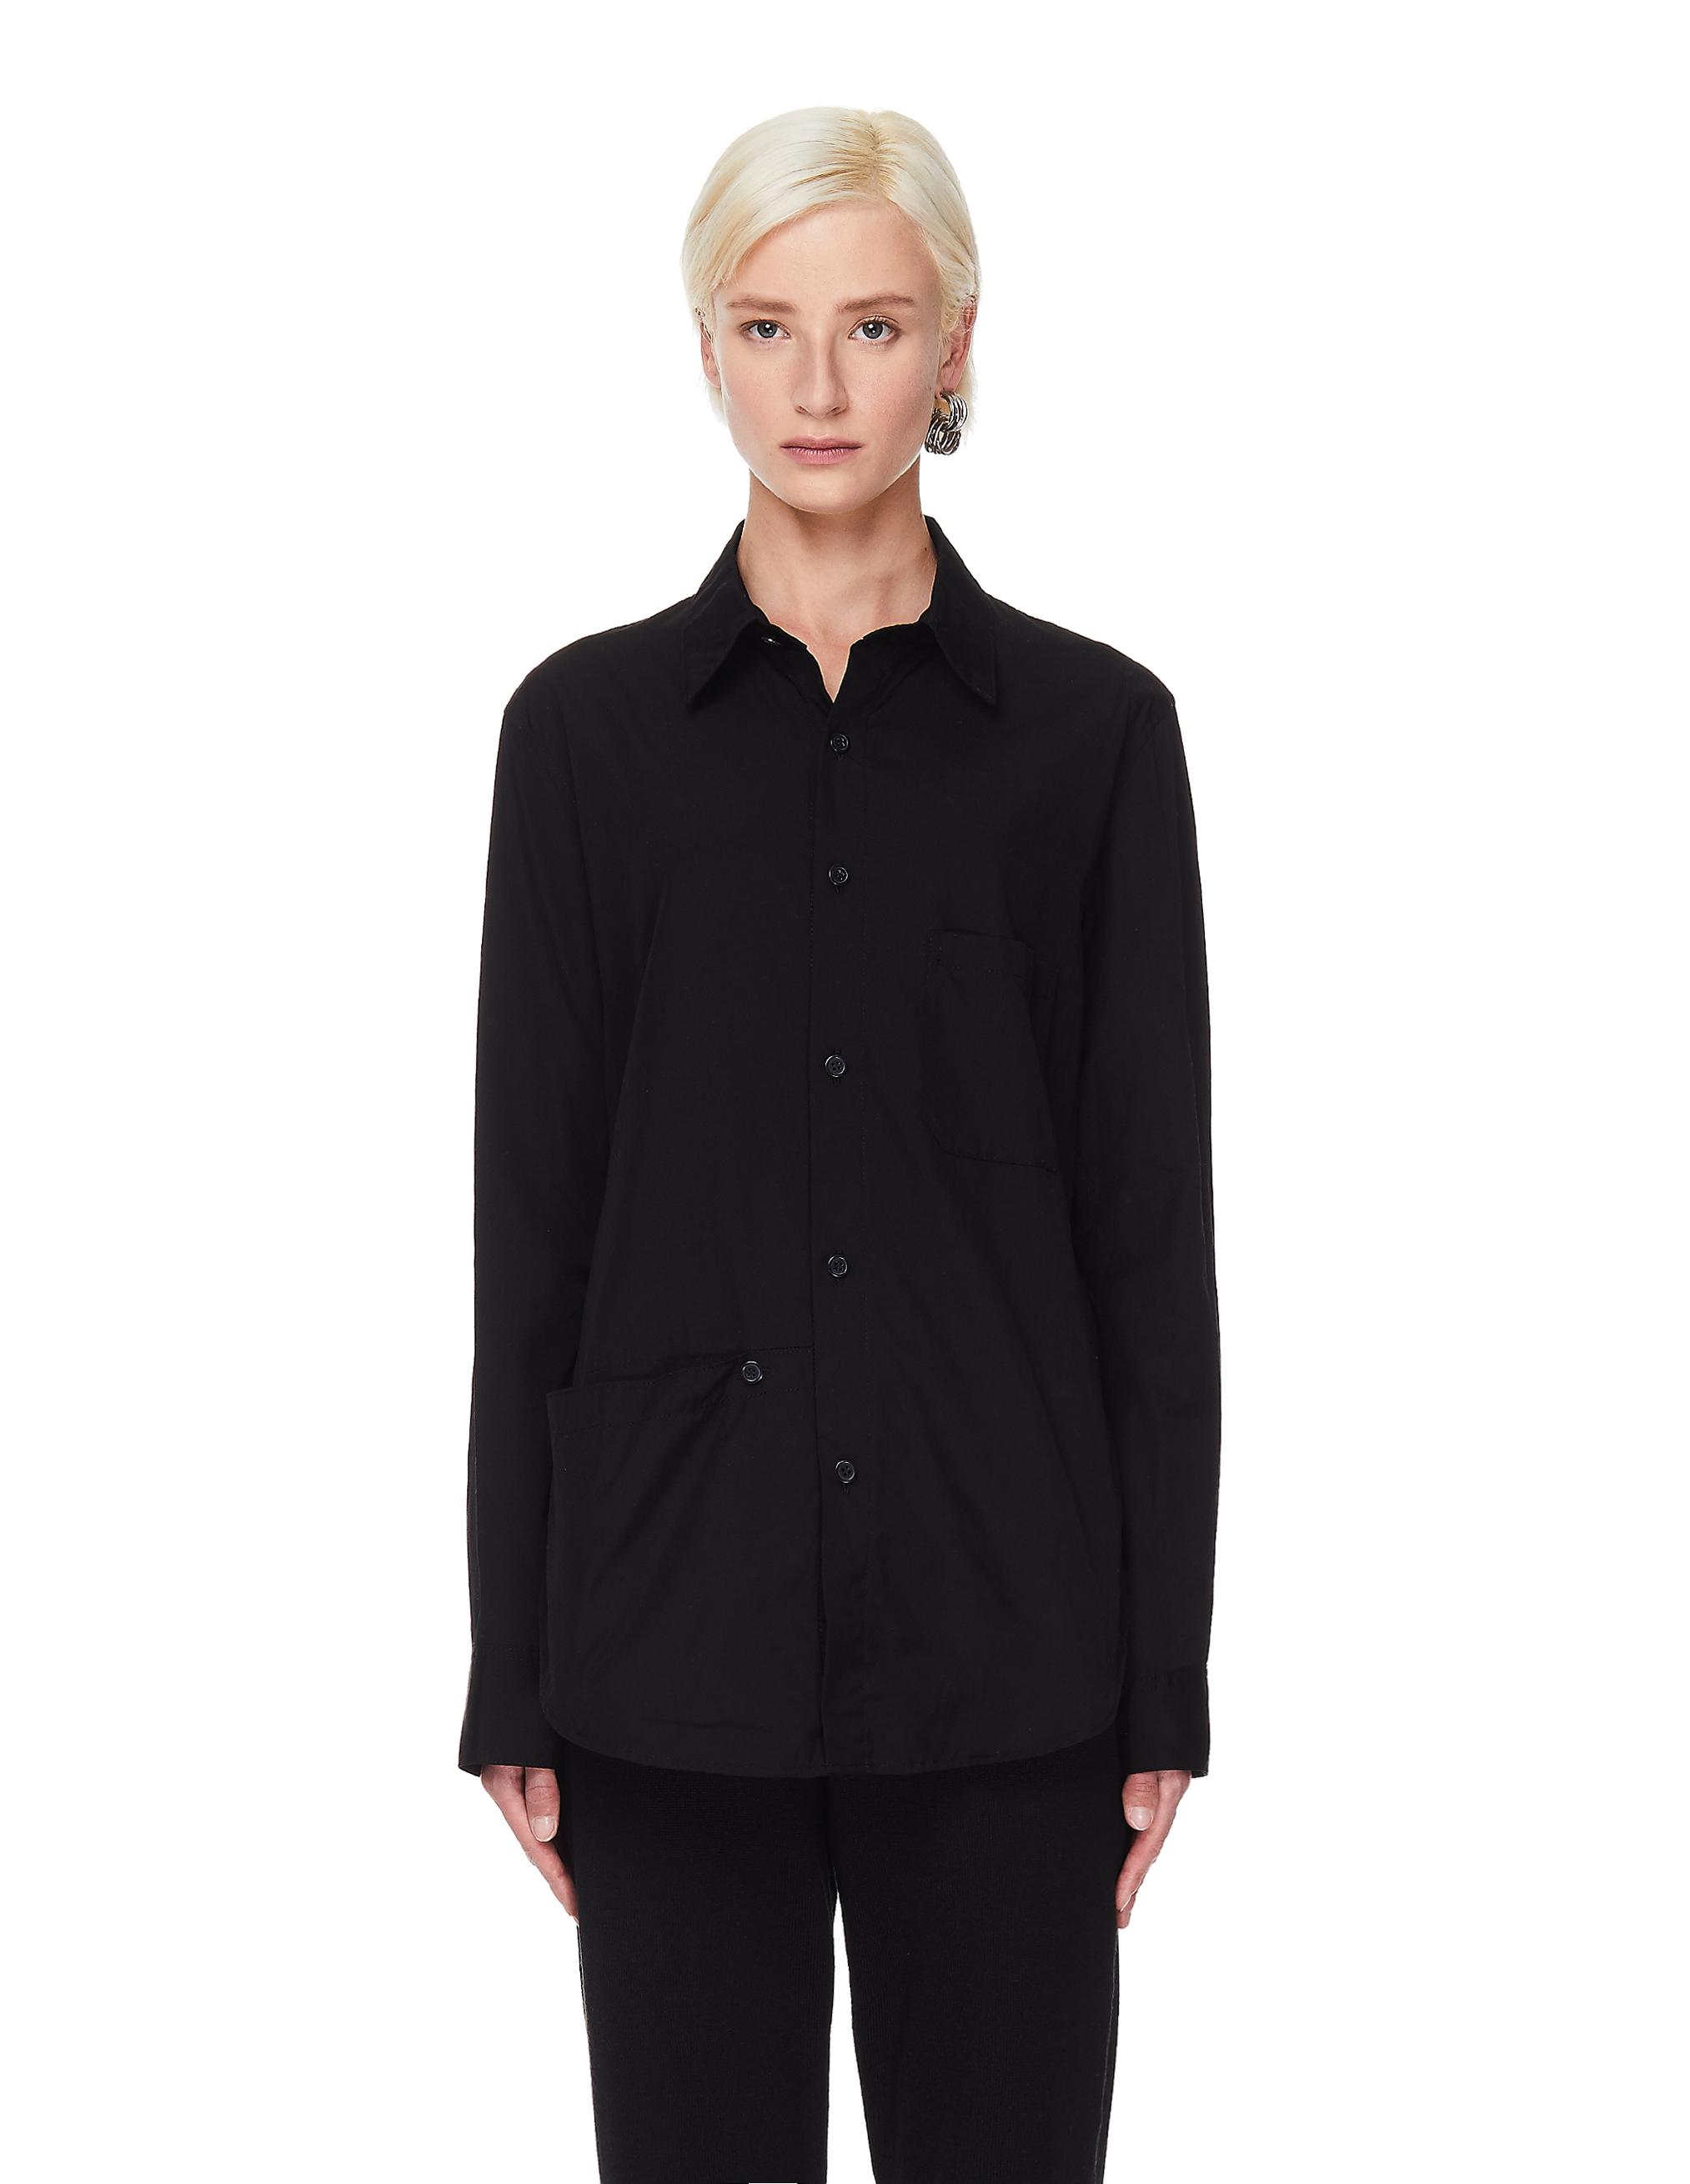 Ys Black Shirt With Pockets